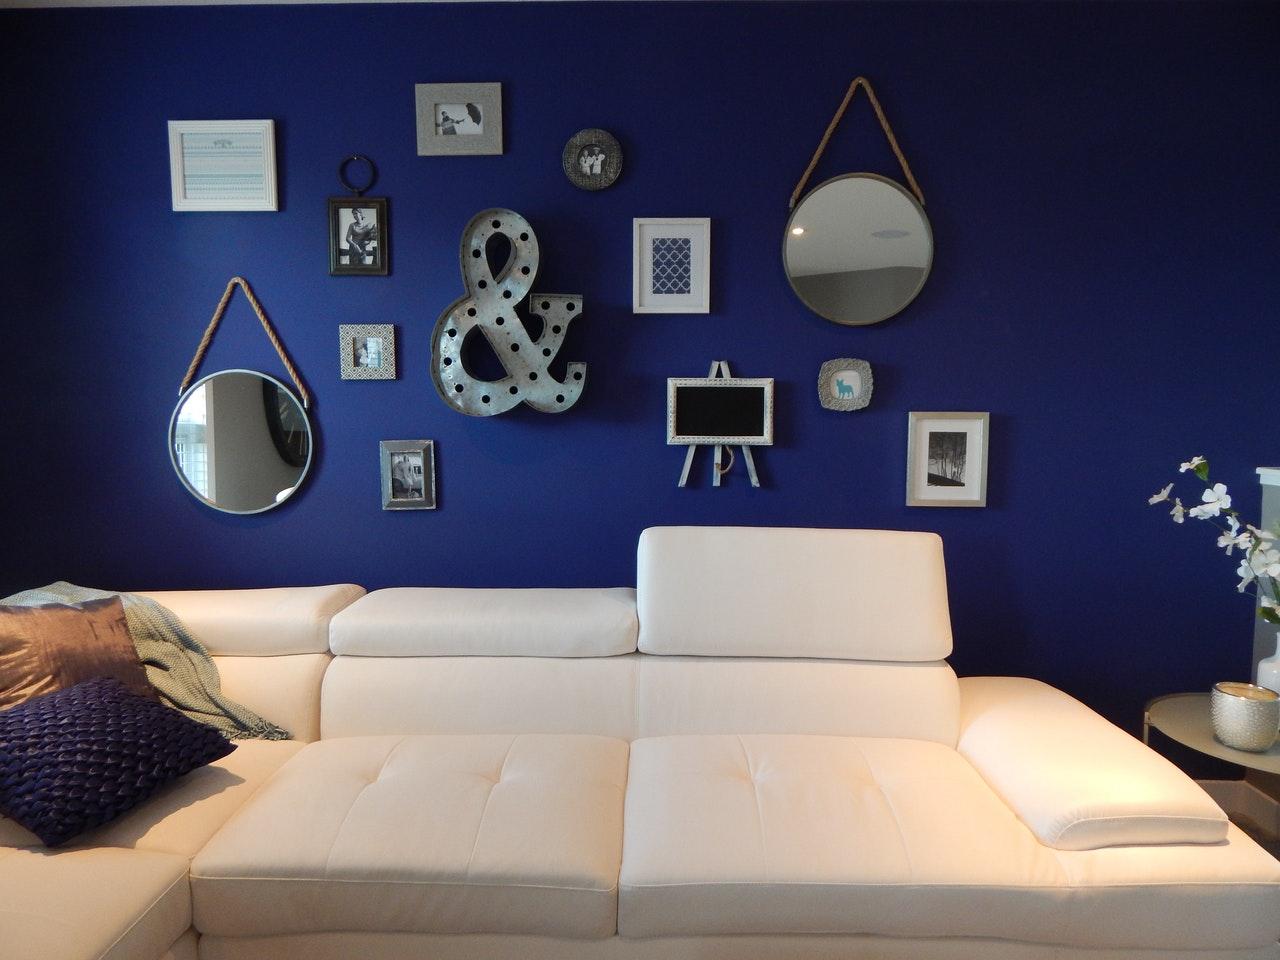 Accessorise the living area